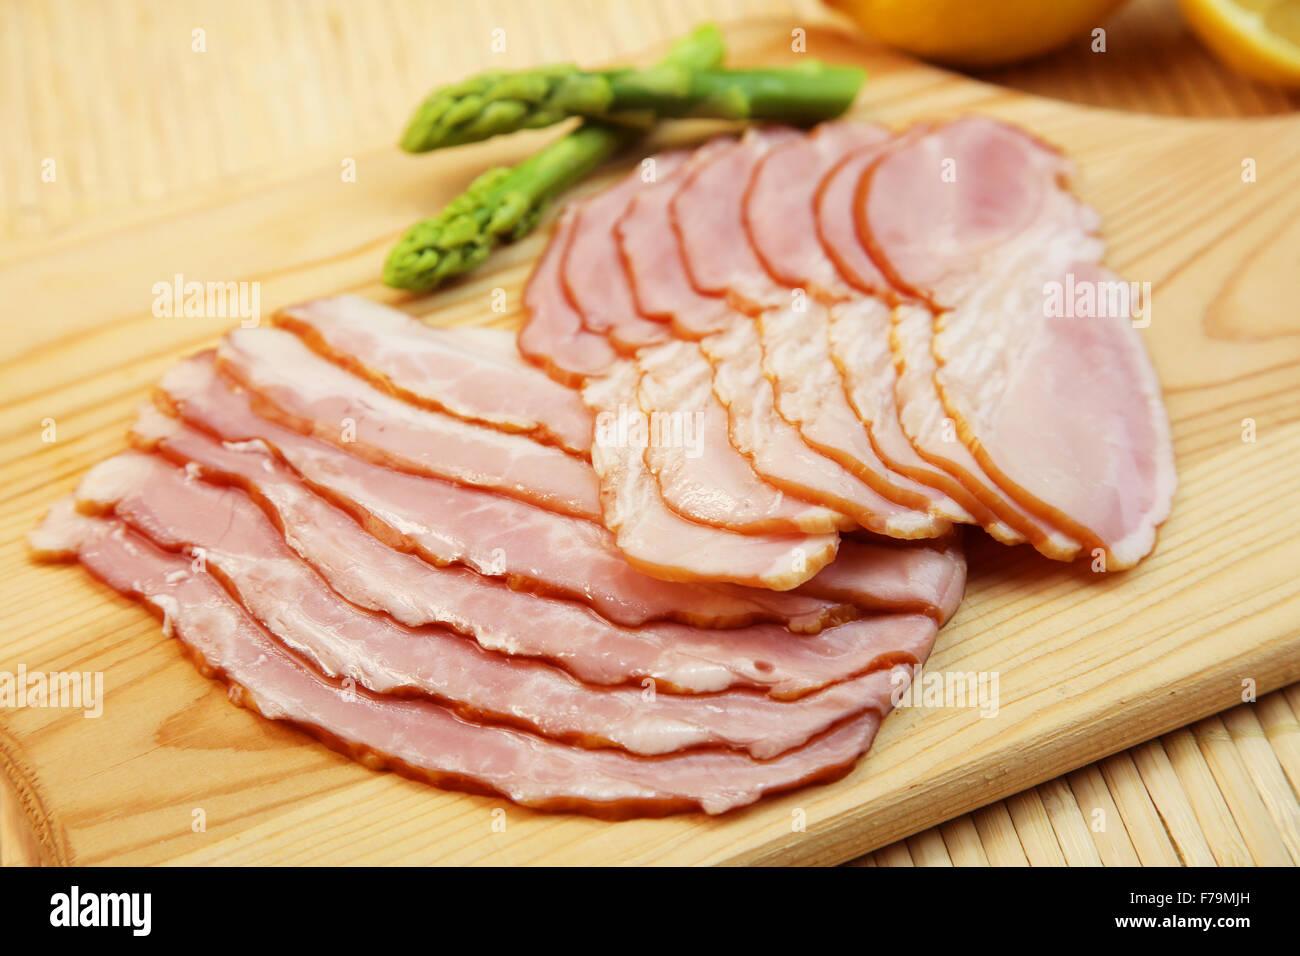 Sliced Bacon Stock Photo